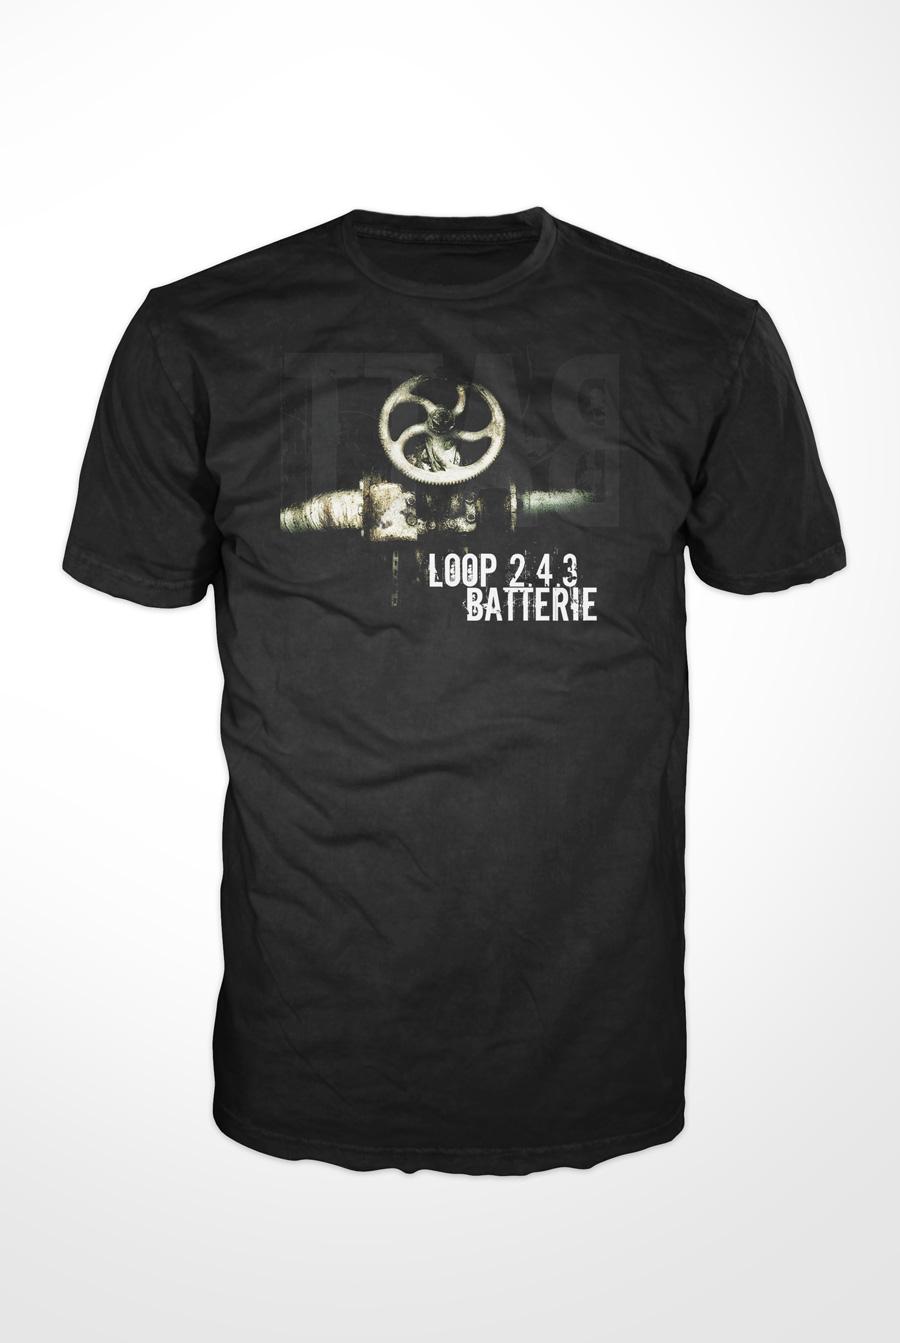 LOOP 2.4.3 'BATTERIE' T-SHIRT